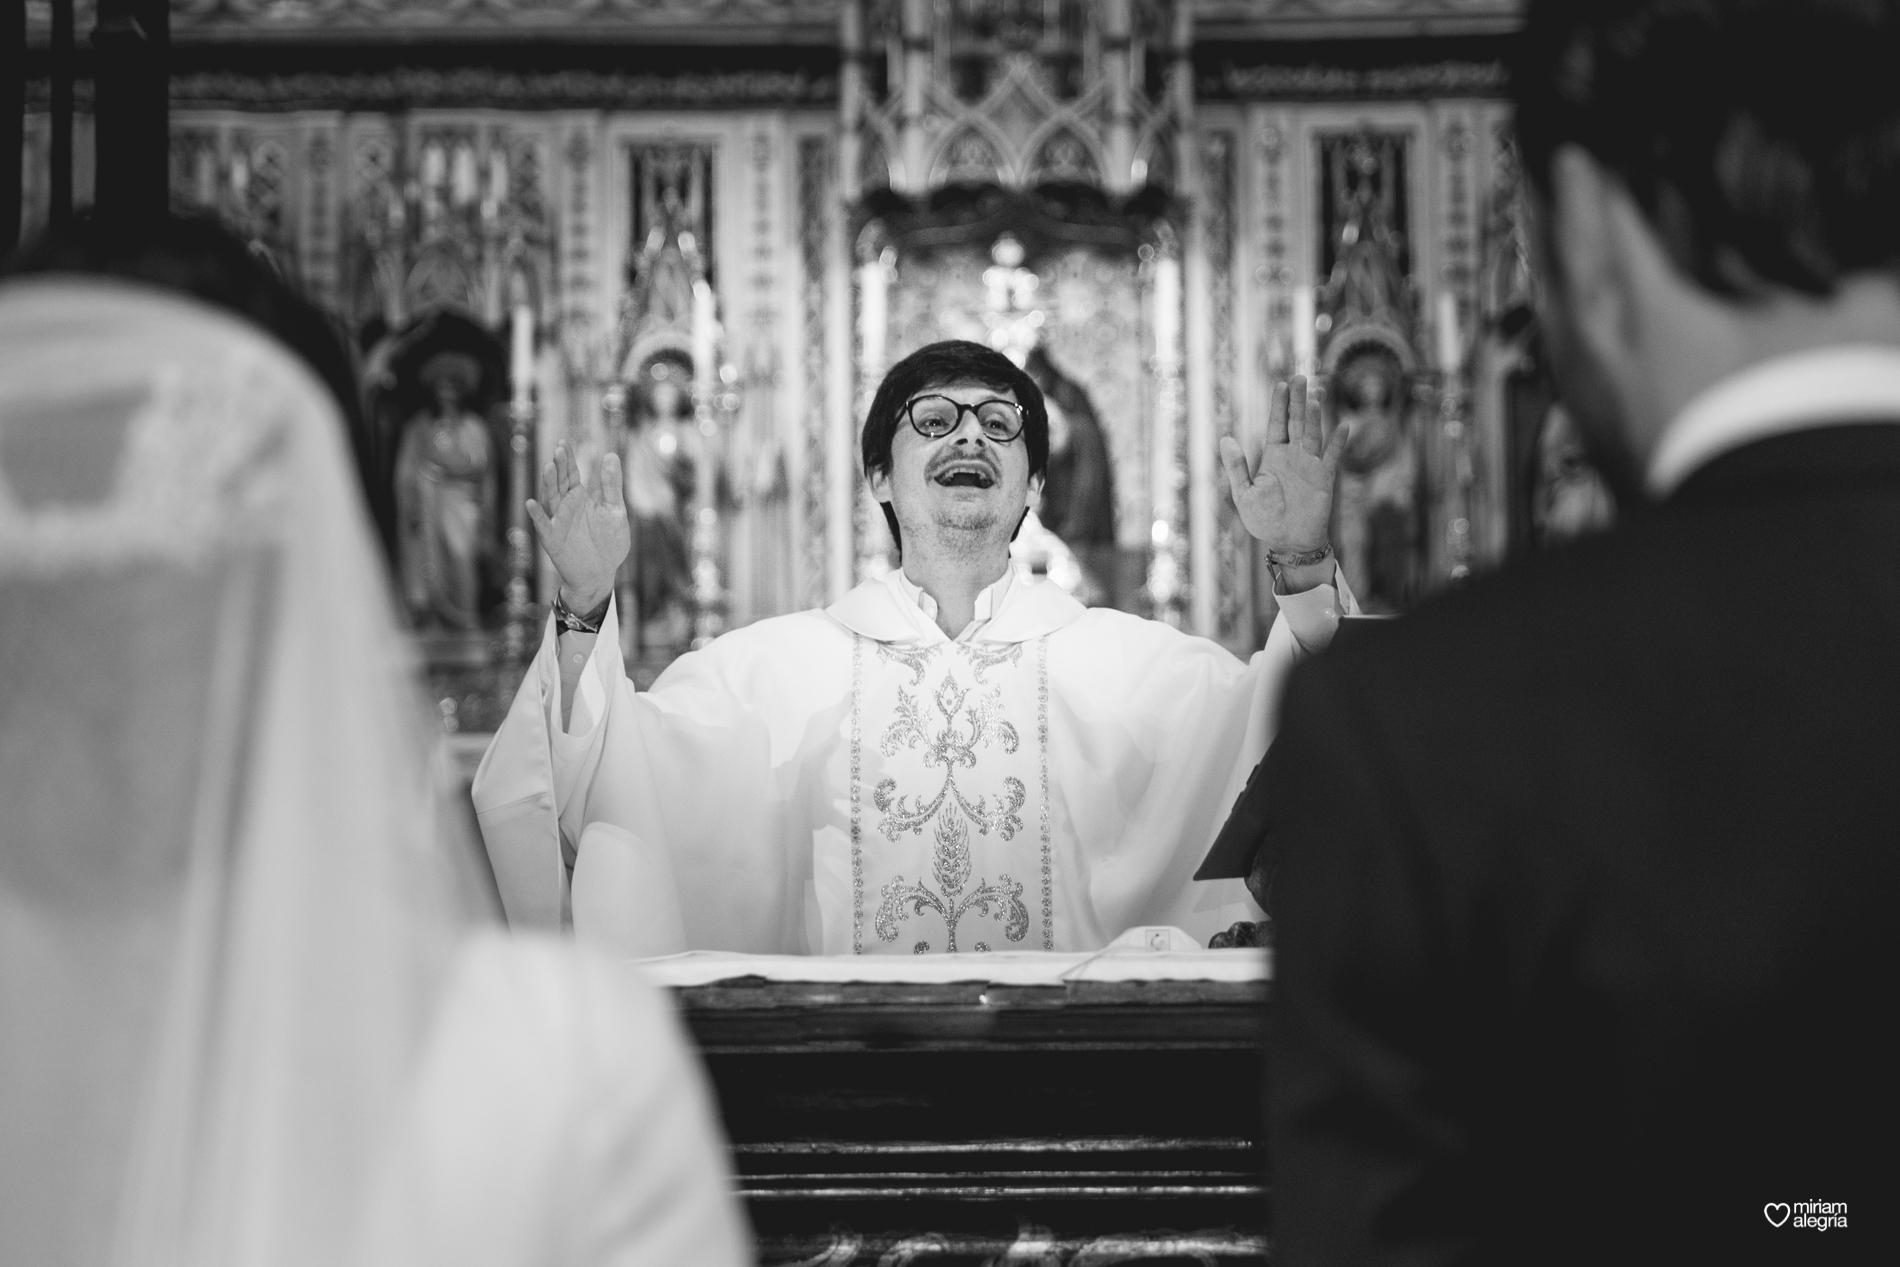 boda-en-la-catedral-de-murcia-miriam-alegria-fotografos-boda-murcia-55